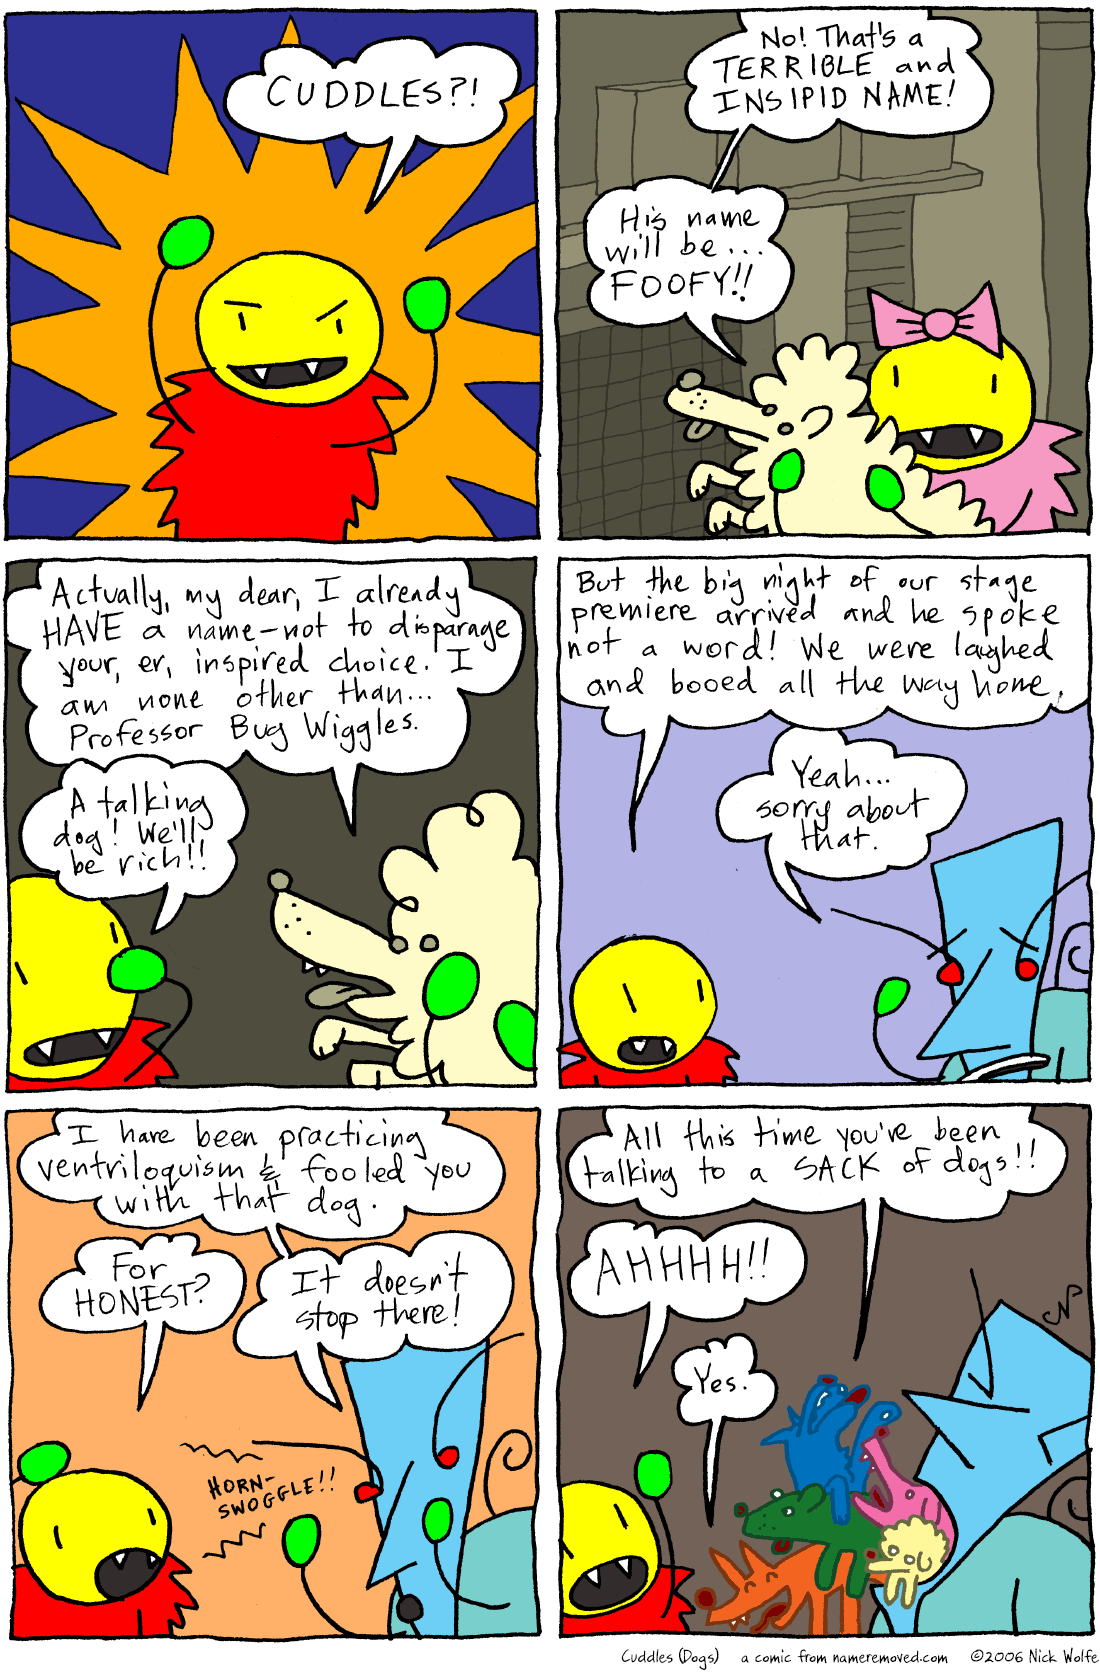 Cuddles (Dogs)